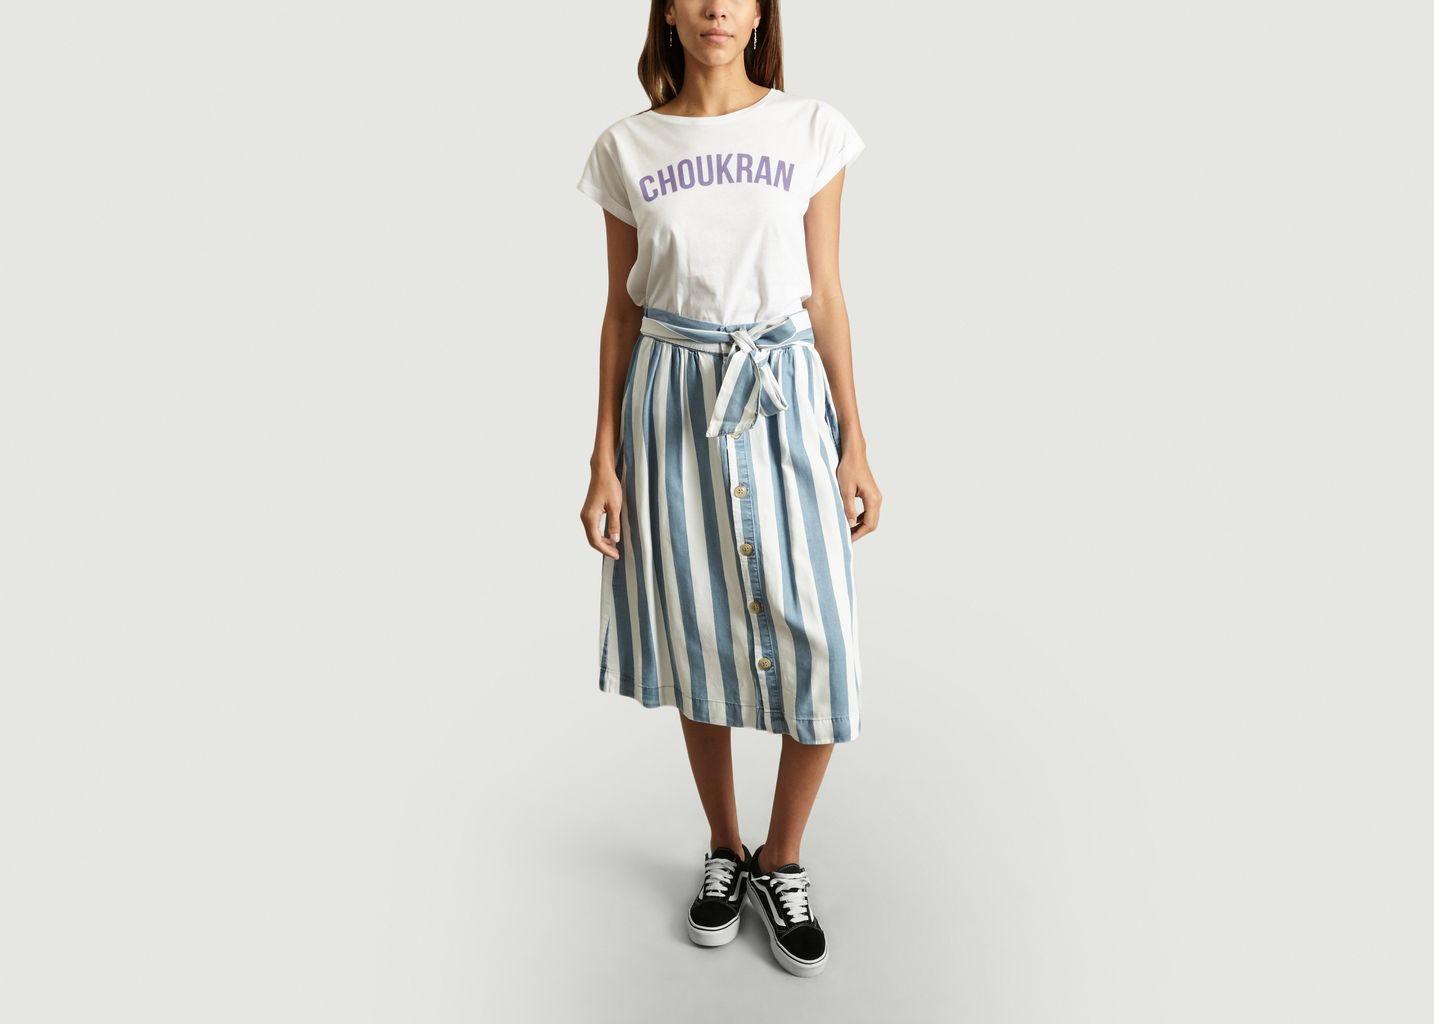 T-Shirt A Lettrage Choukran - Maison Olga